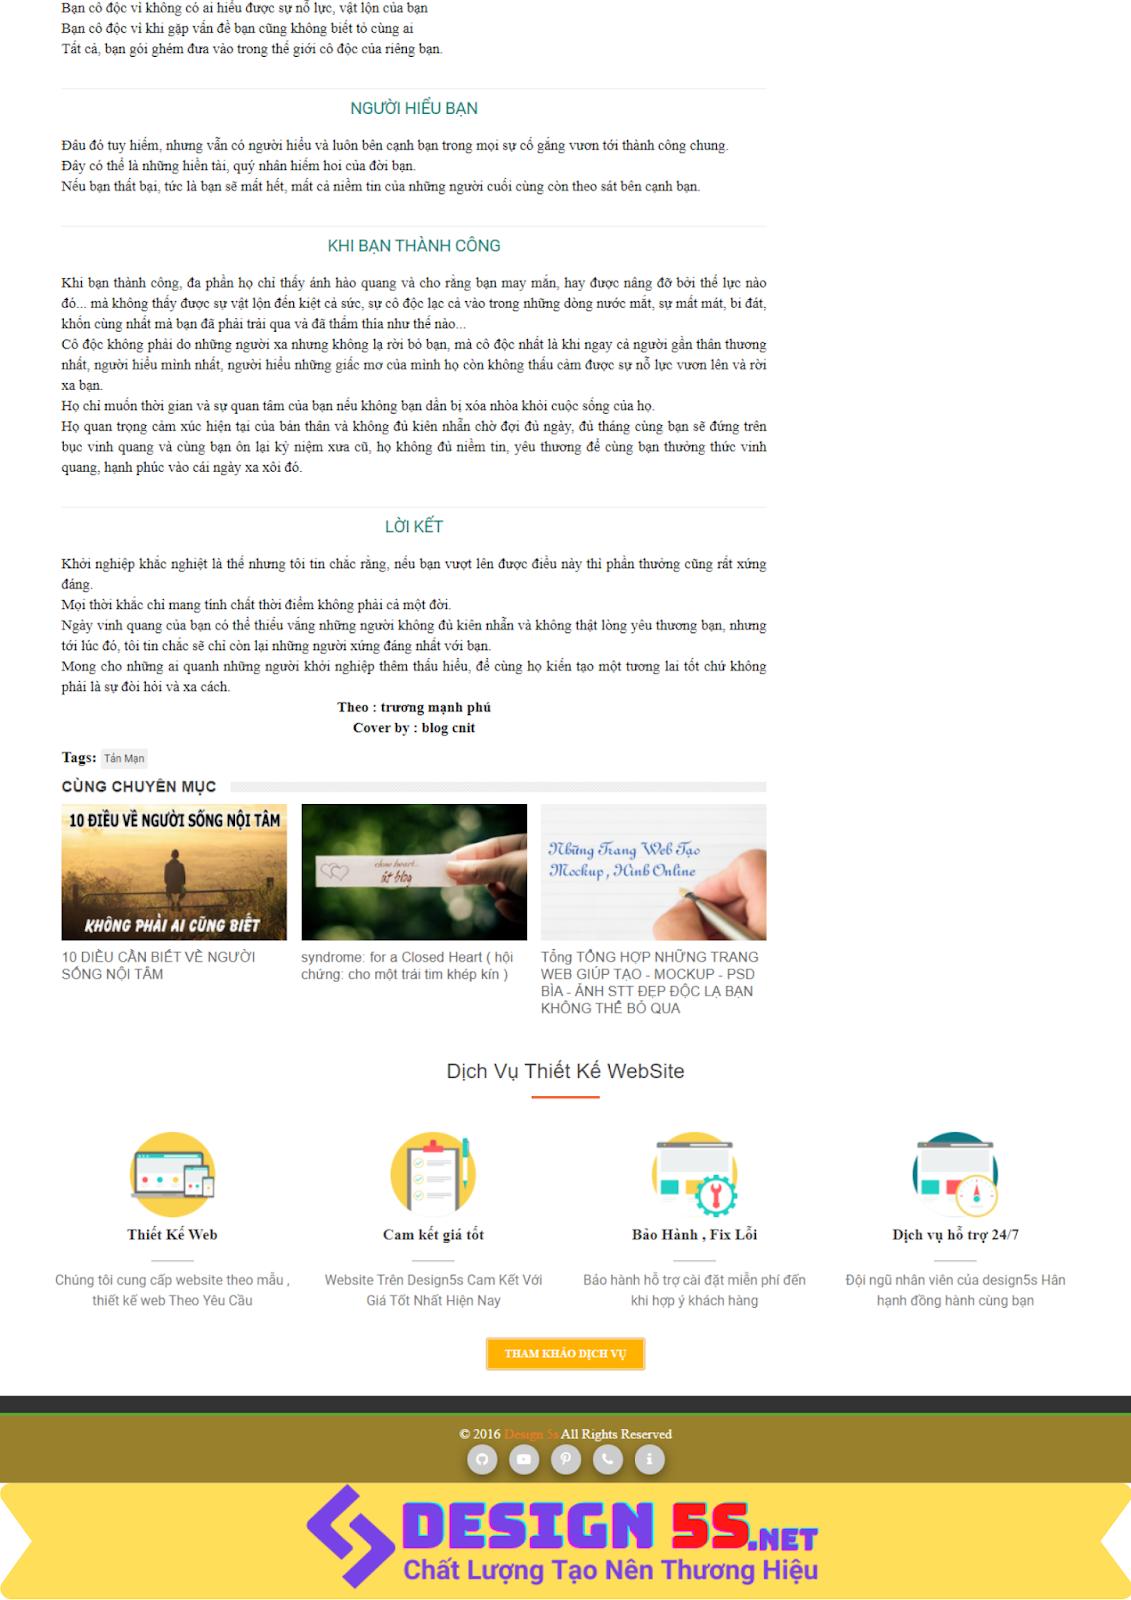 Template blogspot miễn phí ( Blog design 5s ) 2019 - Ảnh 2